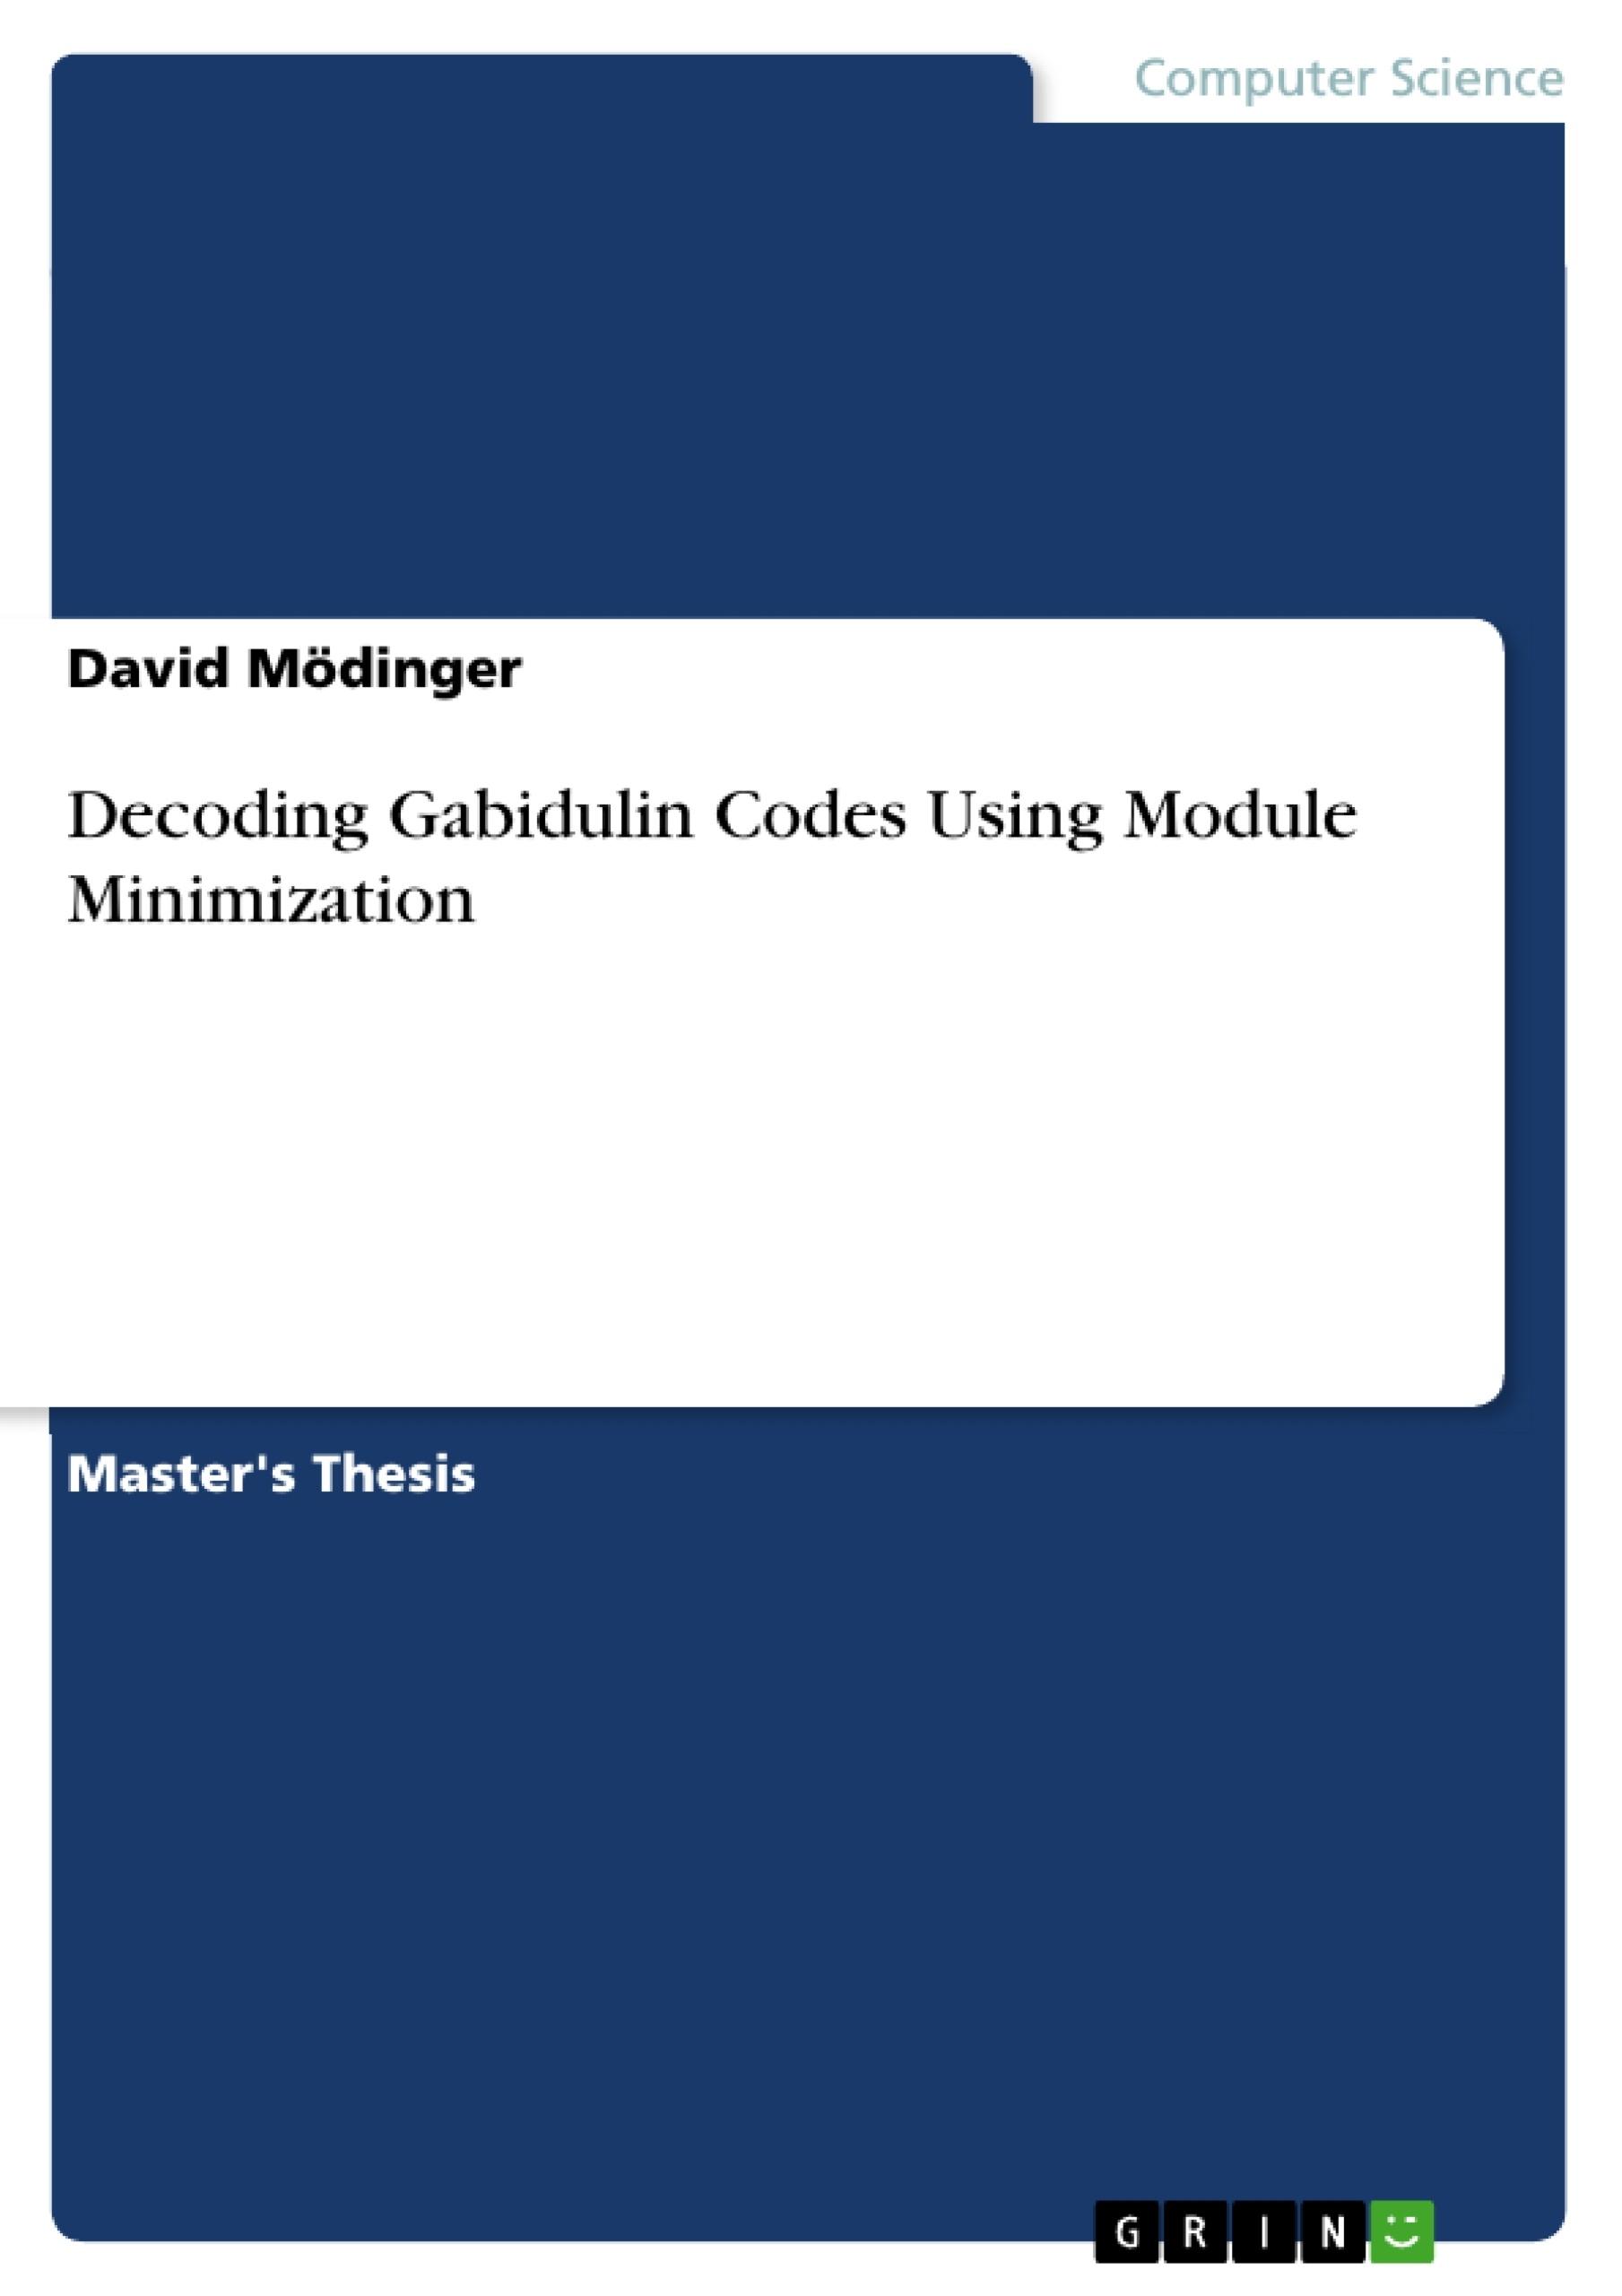 Title: Decoding Gabidulin Codes Using Module Minimization